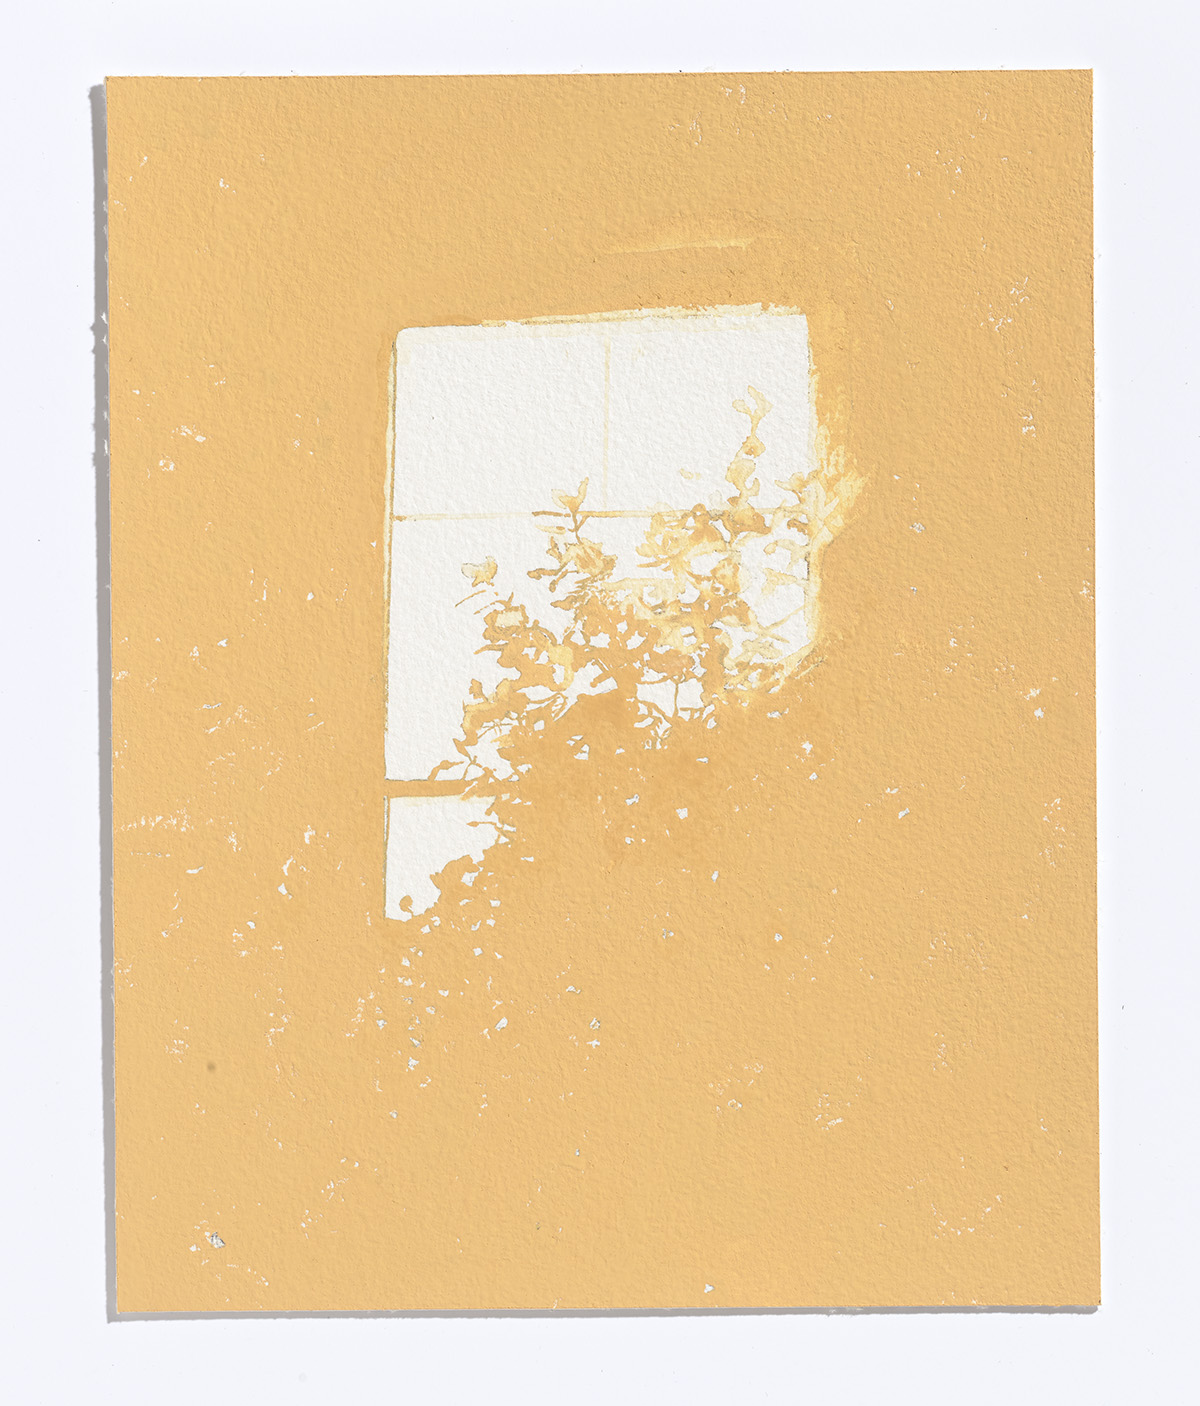 Pale Window,2017, gouache on paper,10 1/8th x 8 in